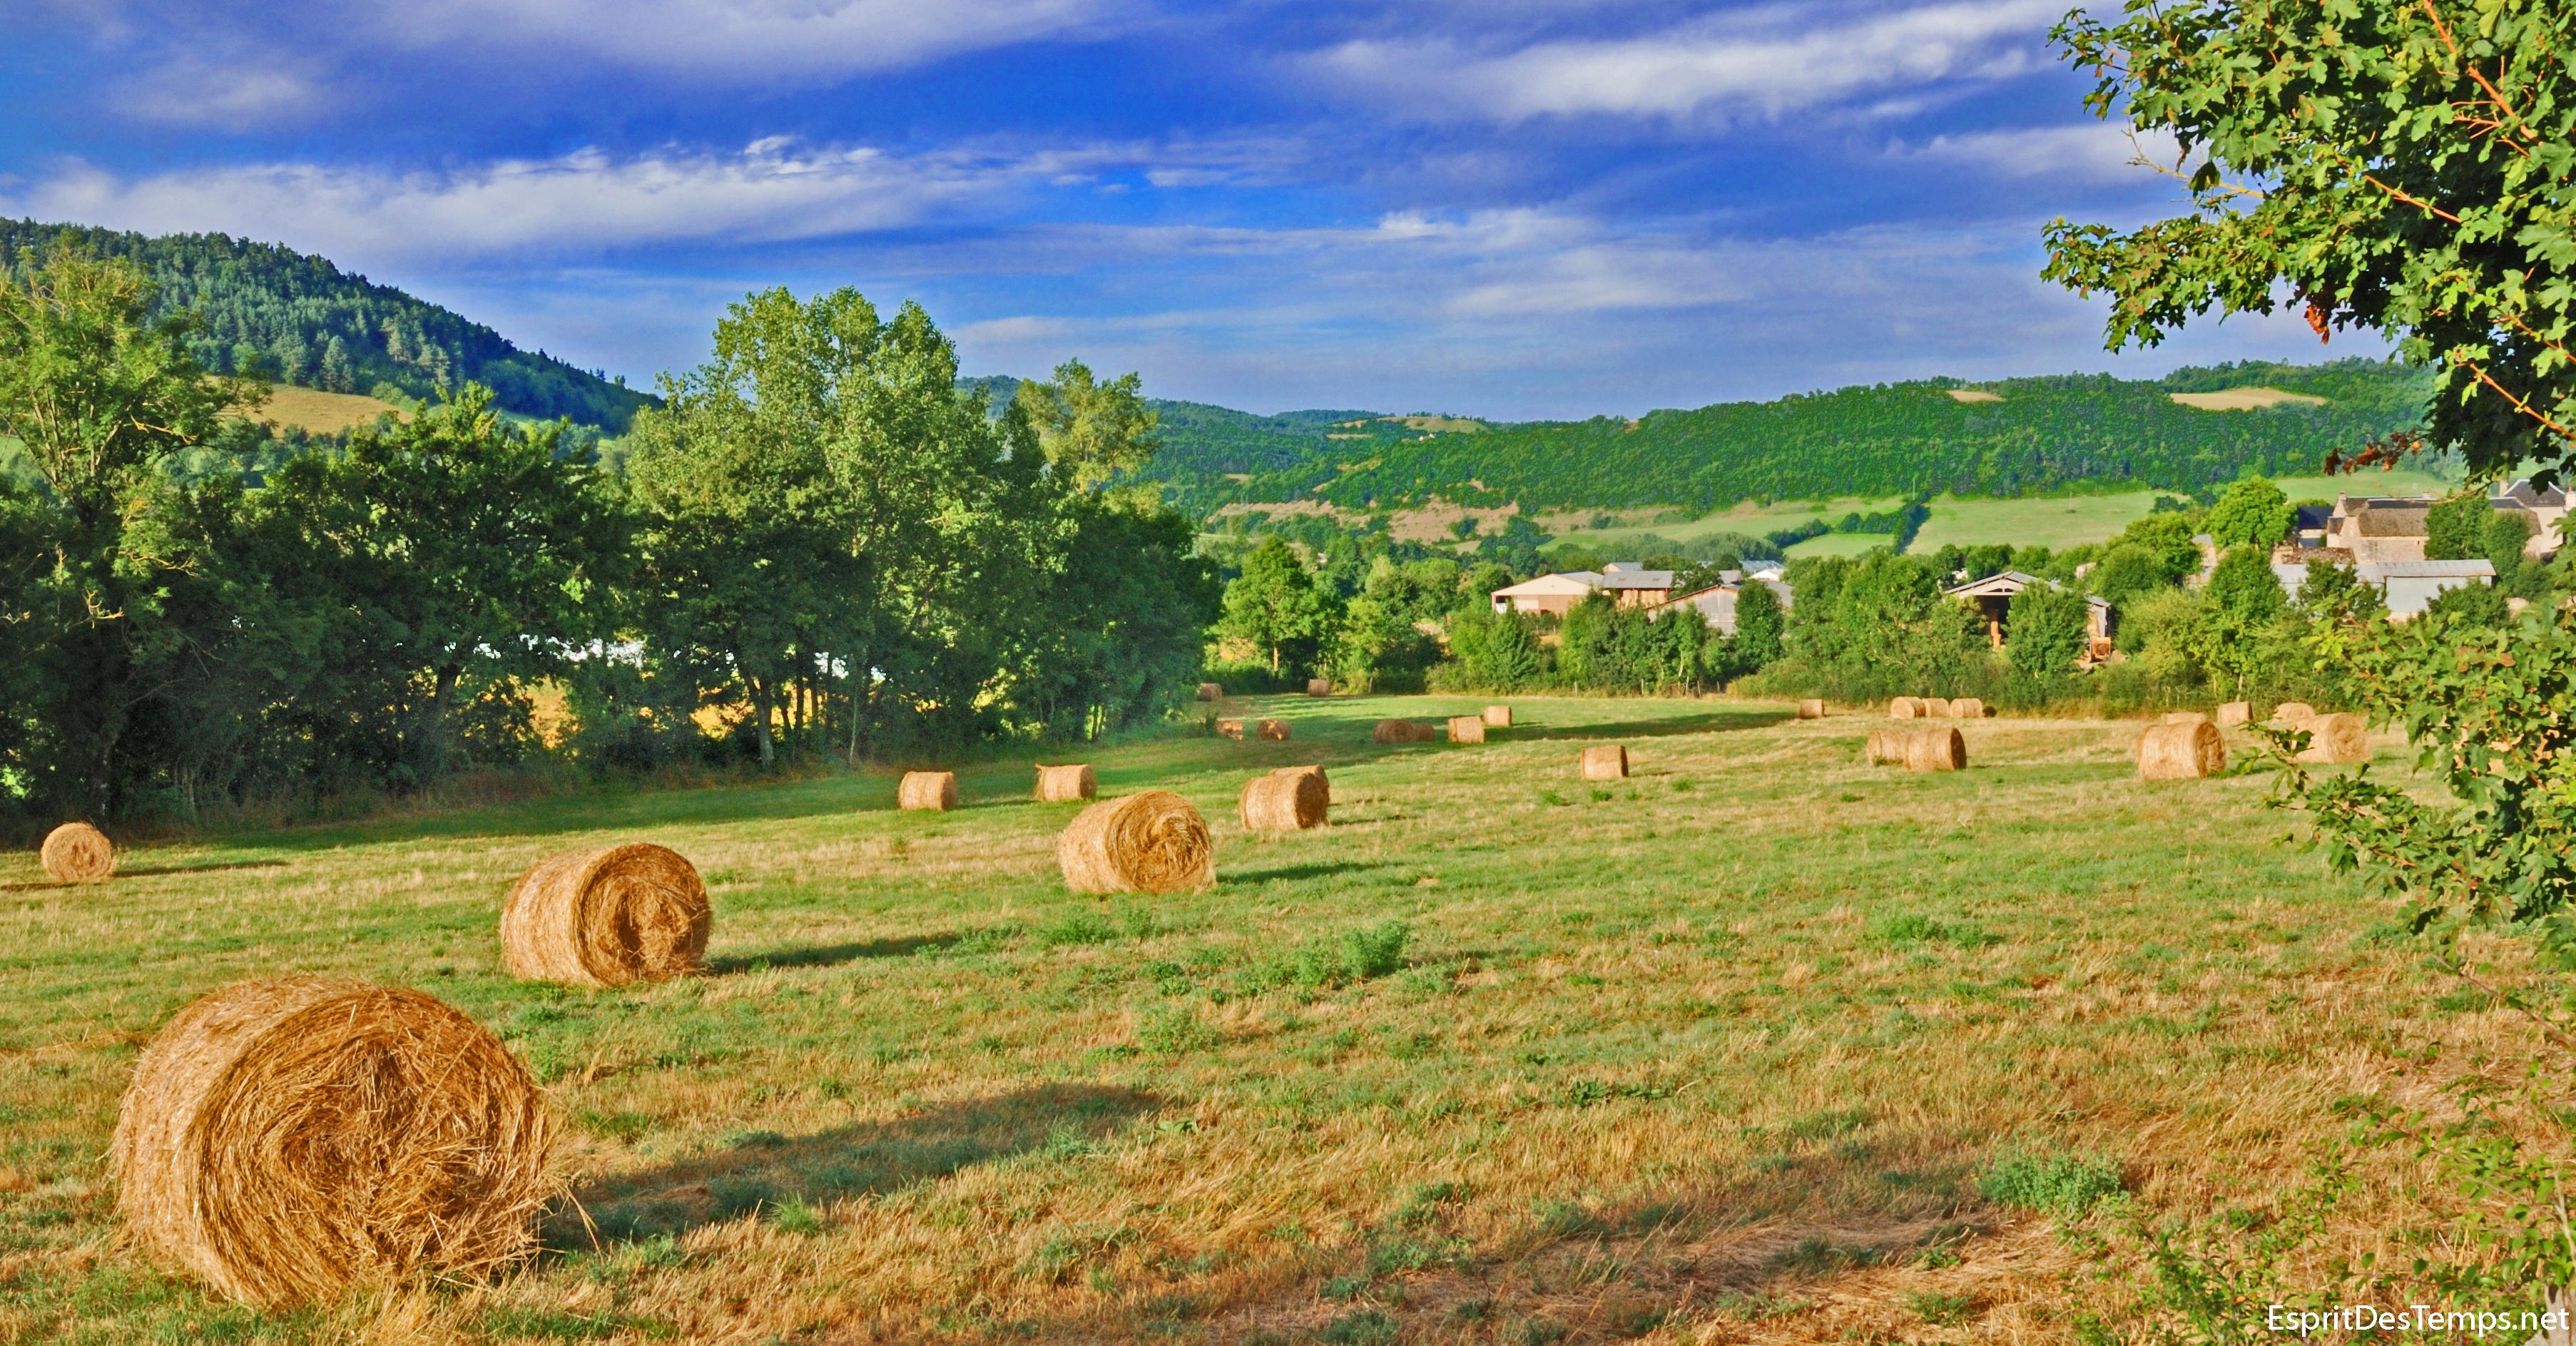 http://farm4.static.flickr.com/3452/3225211830_8f24e7b7d7_o.jpg